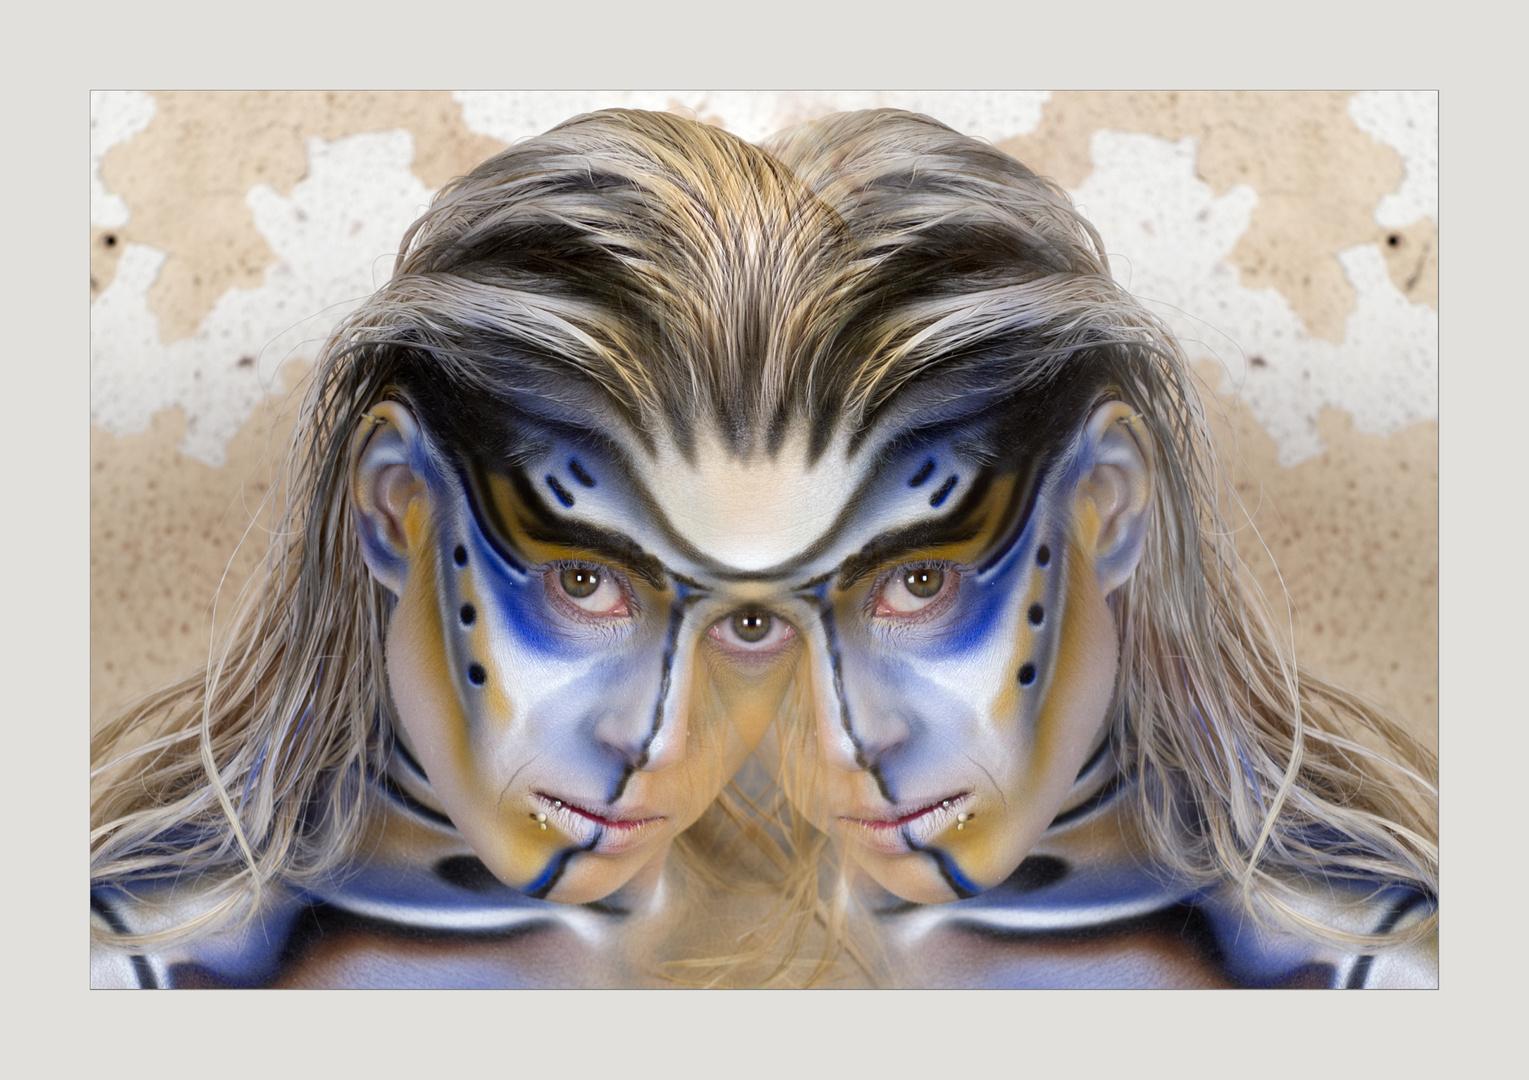 J. Siama (Airbrush-Meister Udo Schurr, Forum Fotografie 2012)